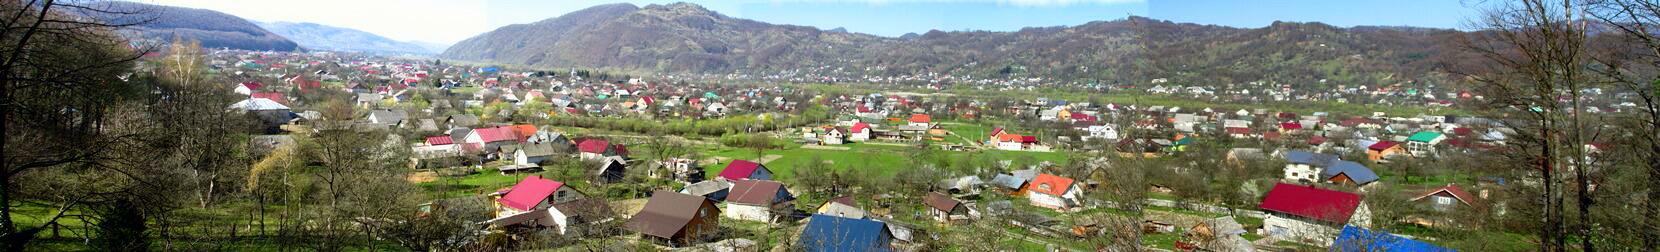 Село Калини. Вид з Орсага